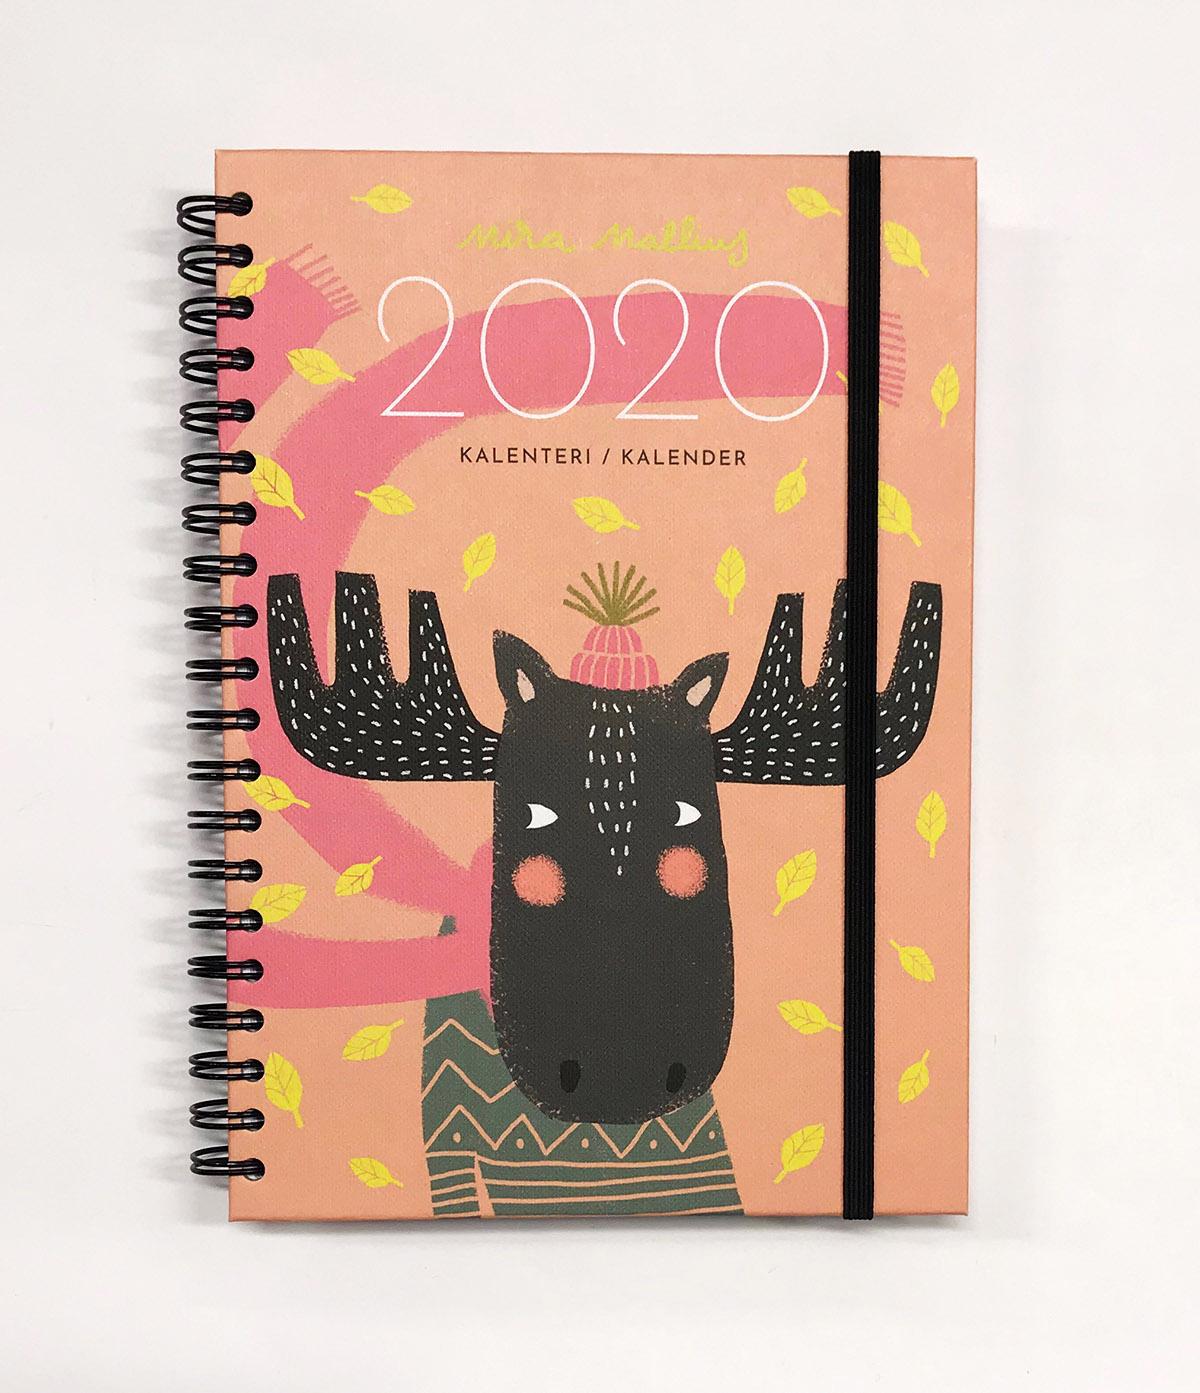 mira mallius kalenteri 2020